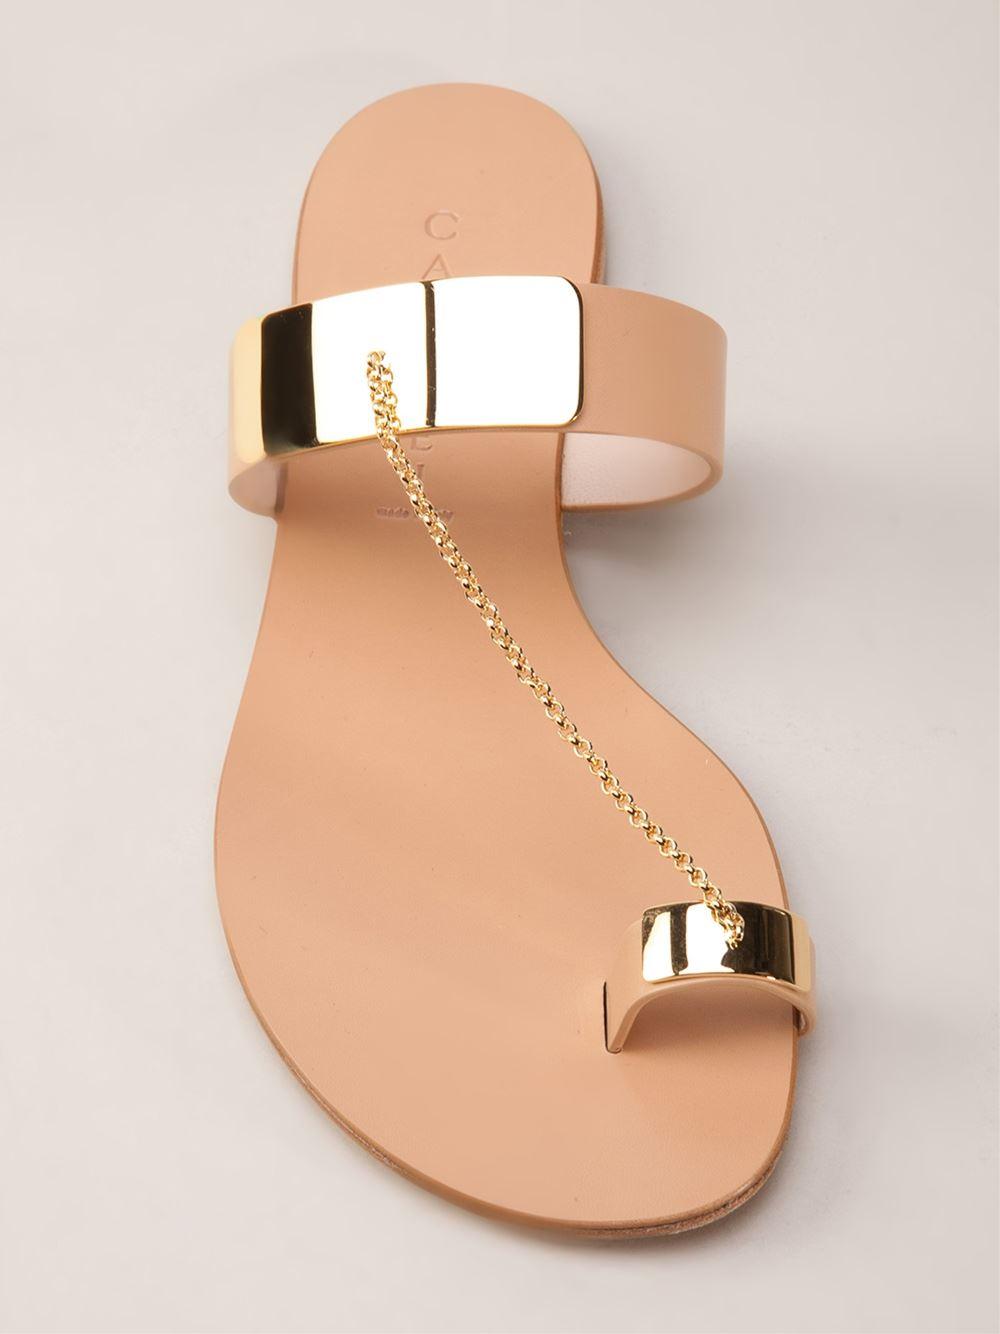 Casadei Gold Plated Sandal - Chuckies New York - Farfetch.com